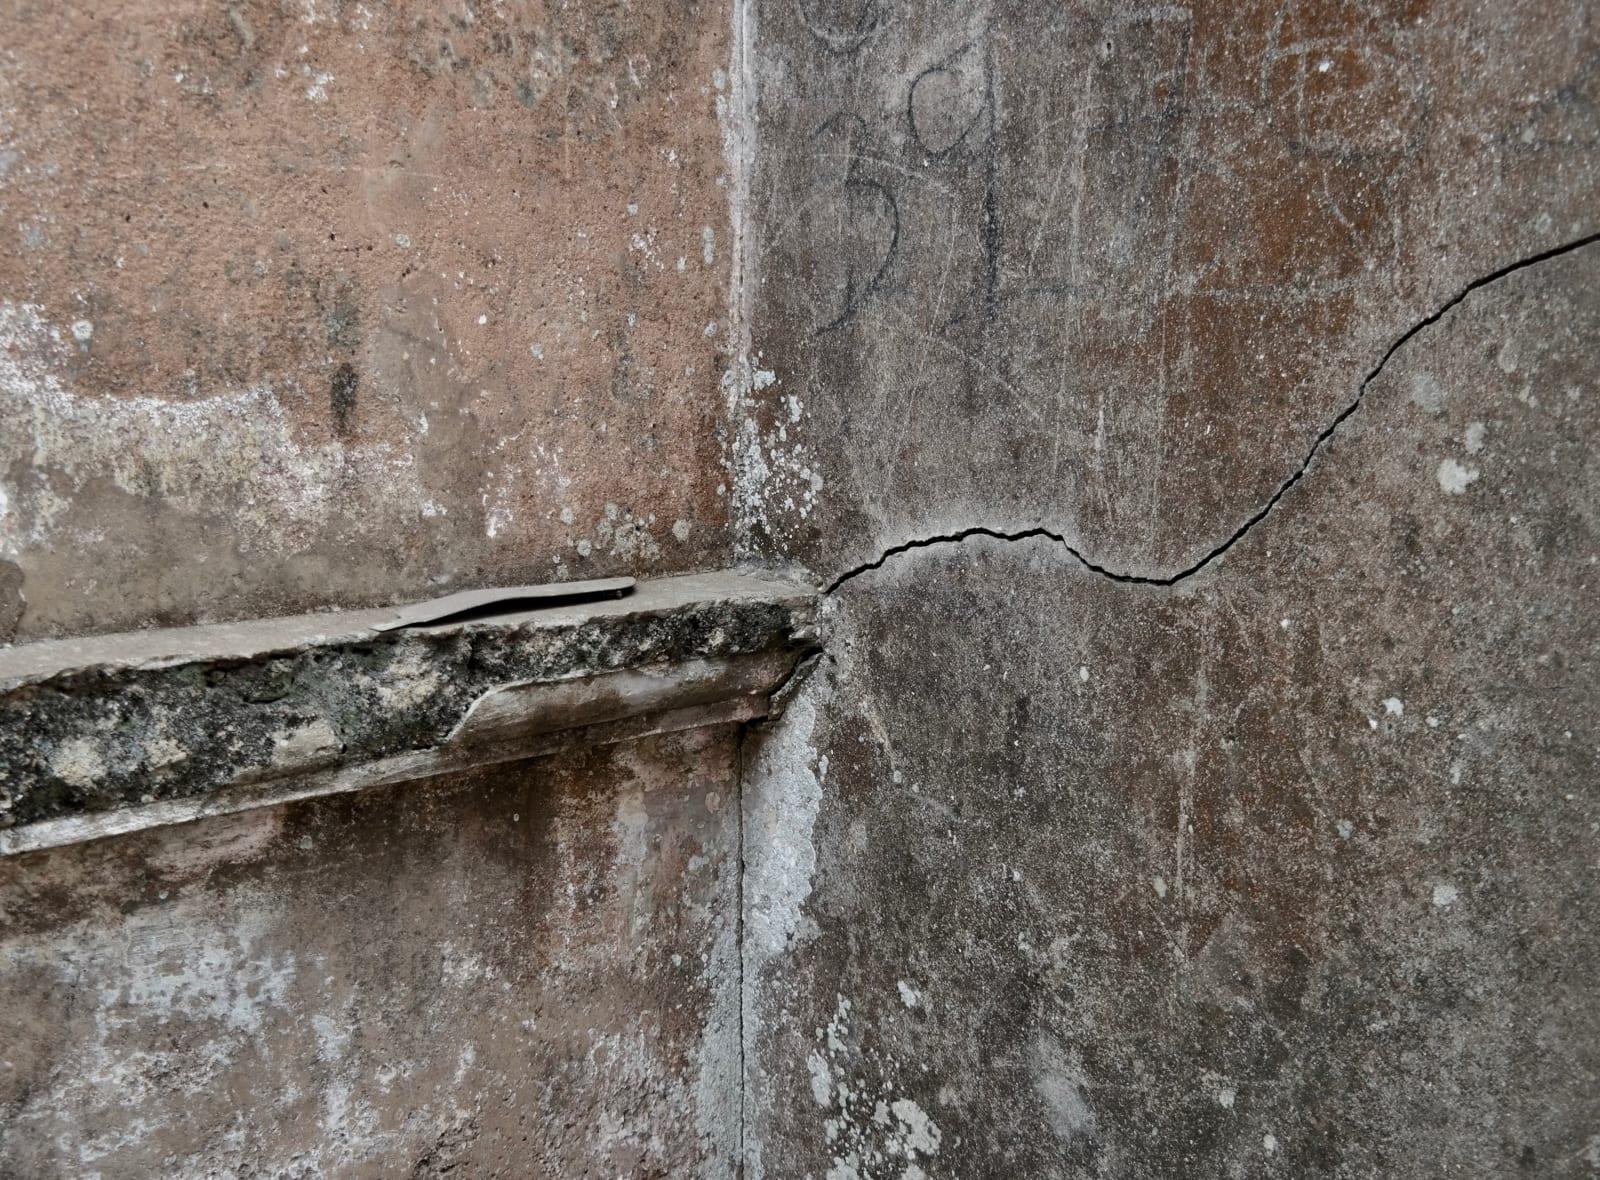 Latifah Iddriss Whispers in dying places ii (inside earth) 42 x 27.67 cm 14.8 x 21 cm Digital print